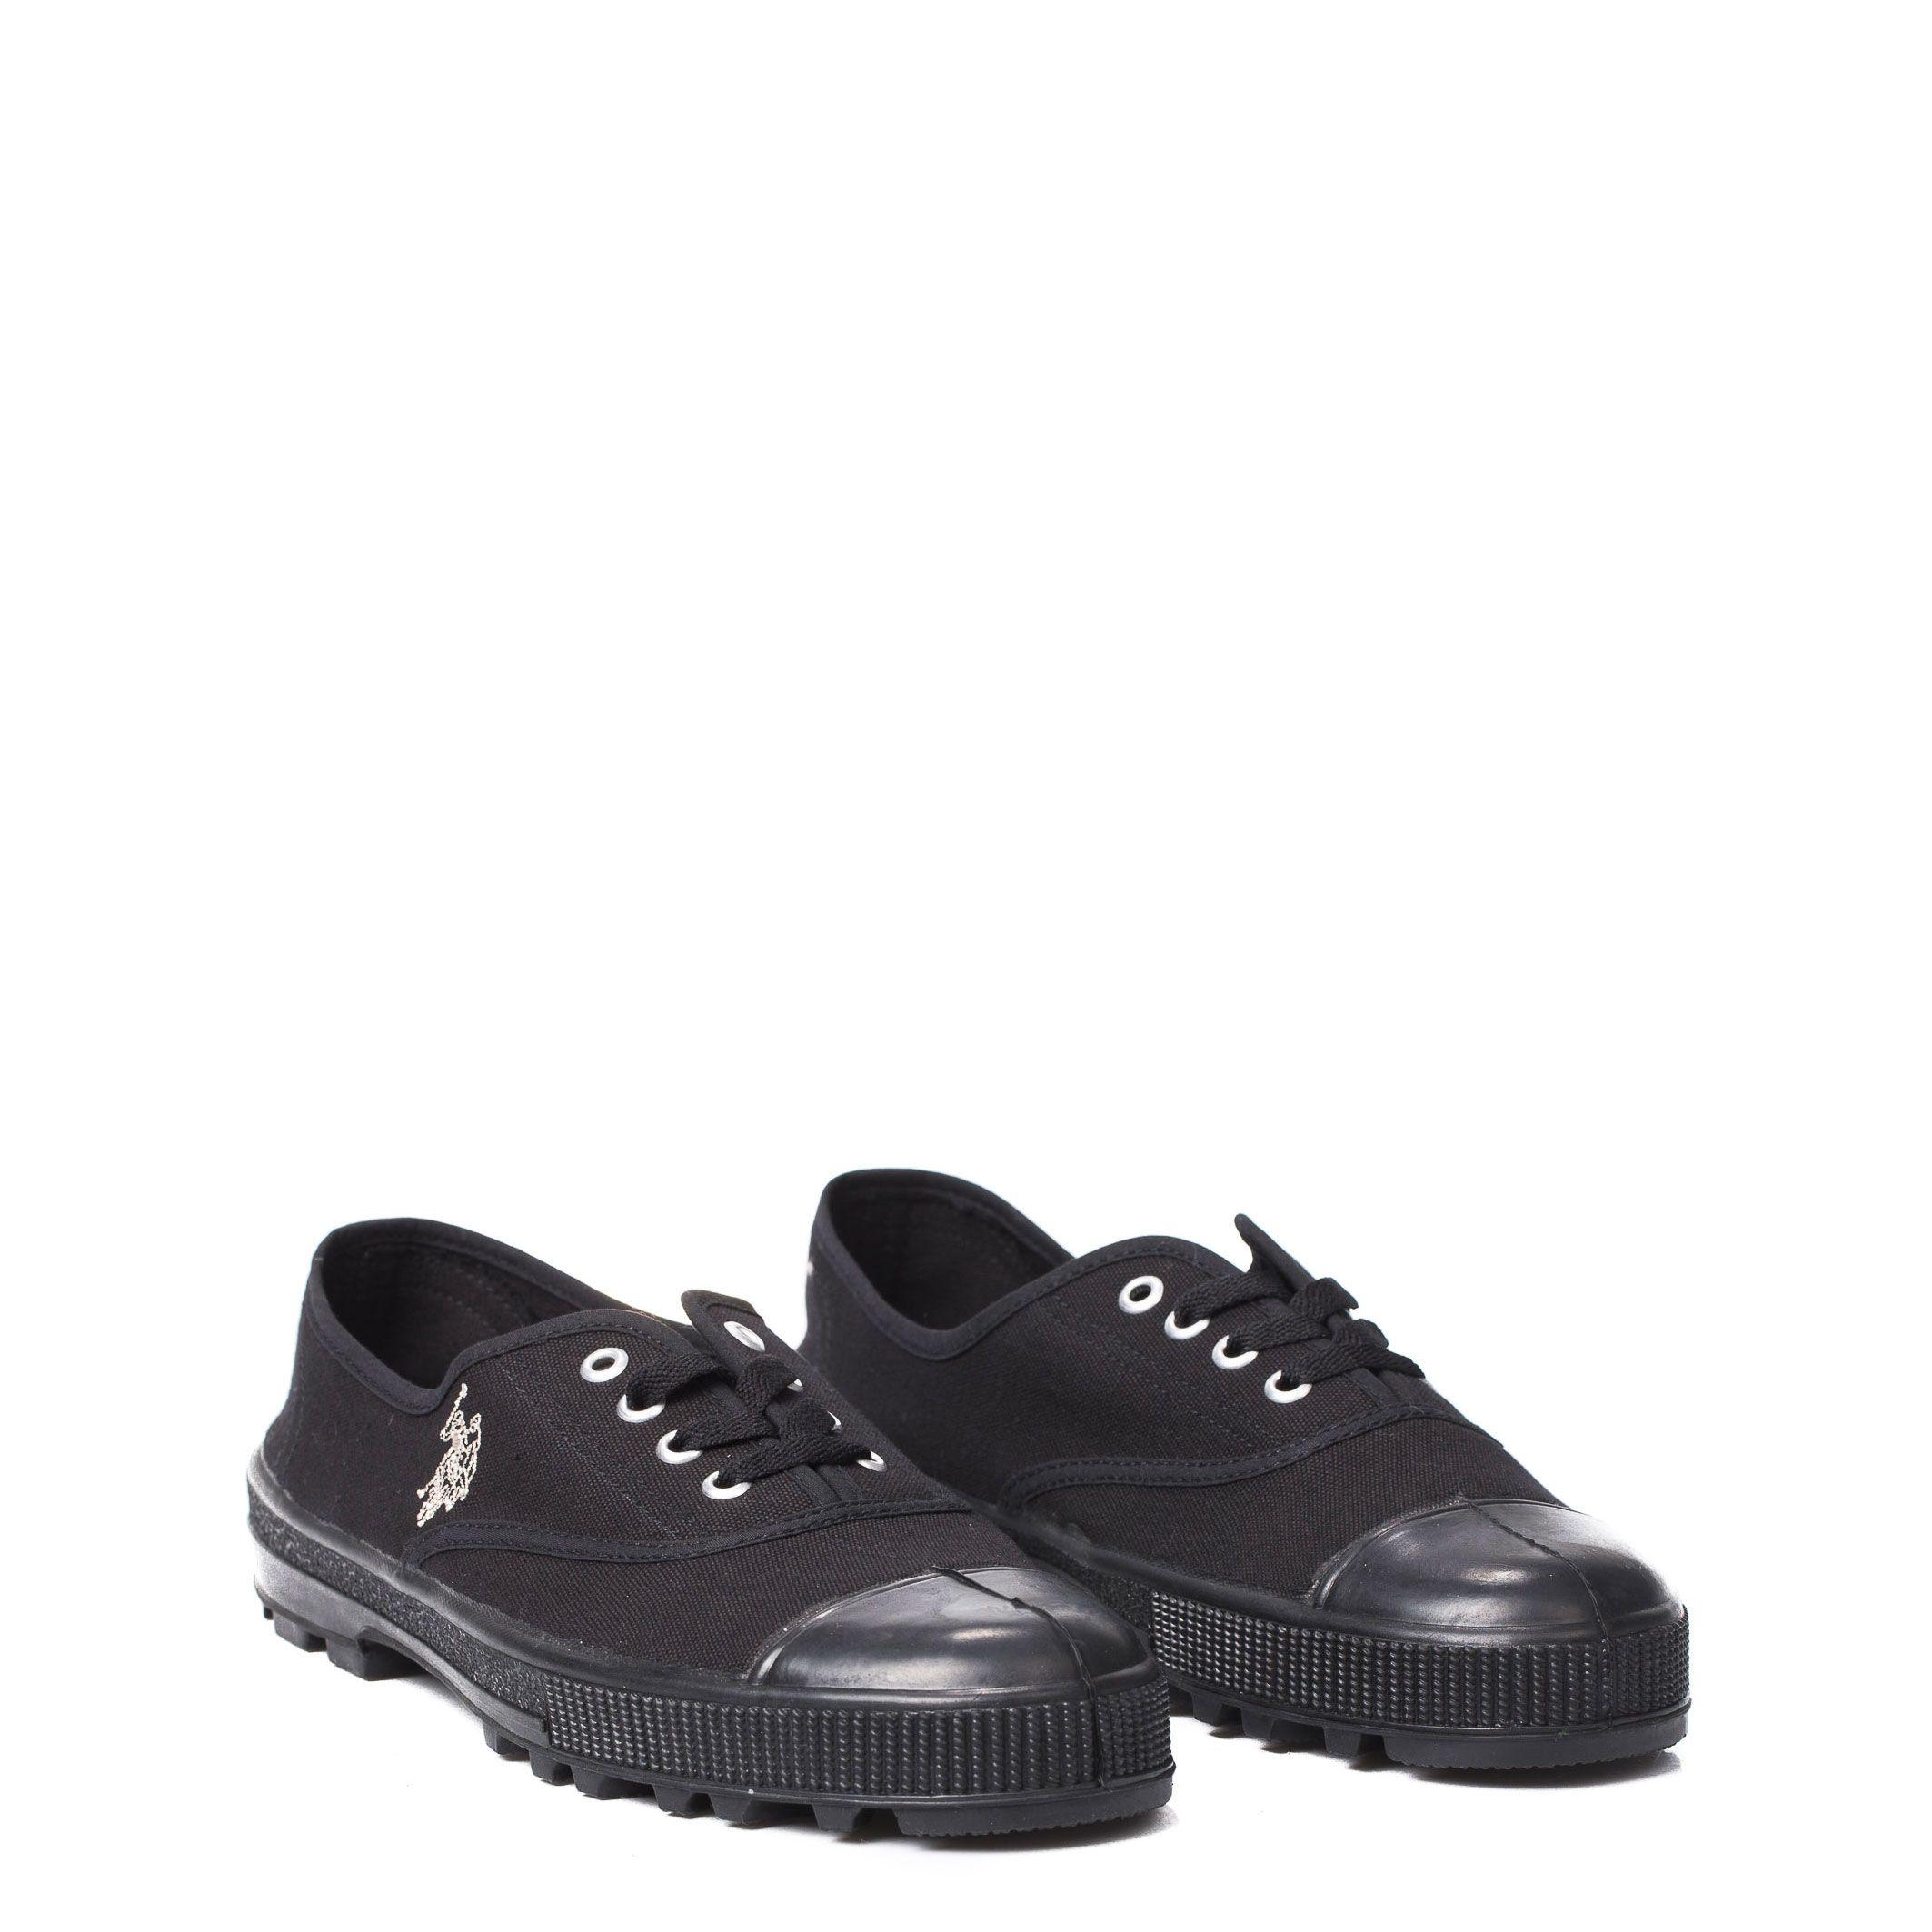 U.S. Polo Assn. Unisexs Sneakers